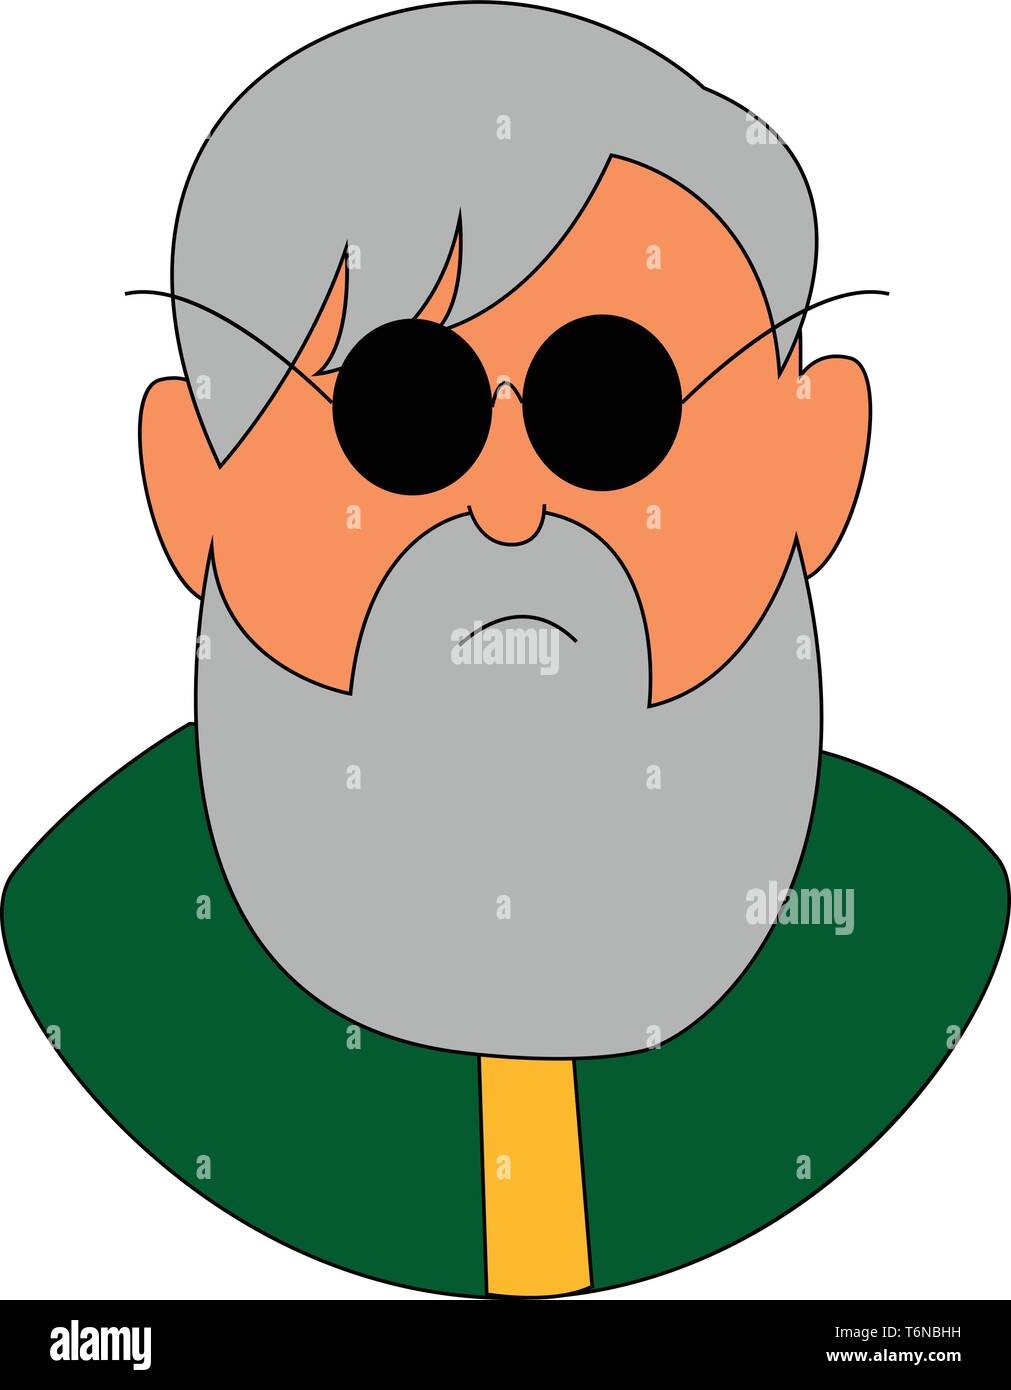 Cartoon Old Arabian Man with Beard | Beard cartoon, Cartoon character  design, Old man cartoon